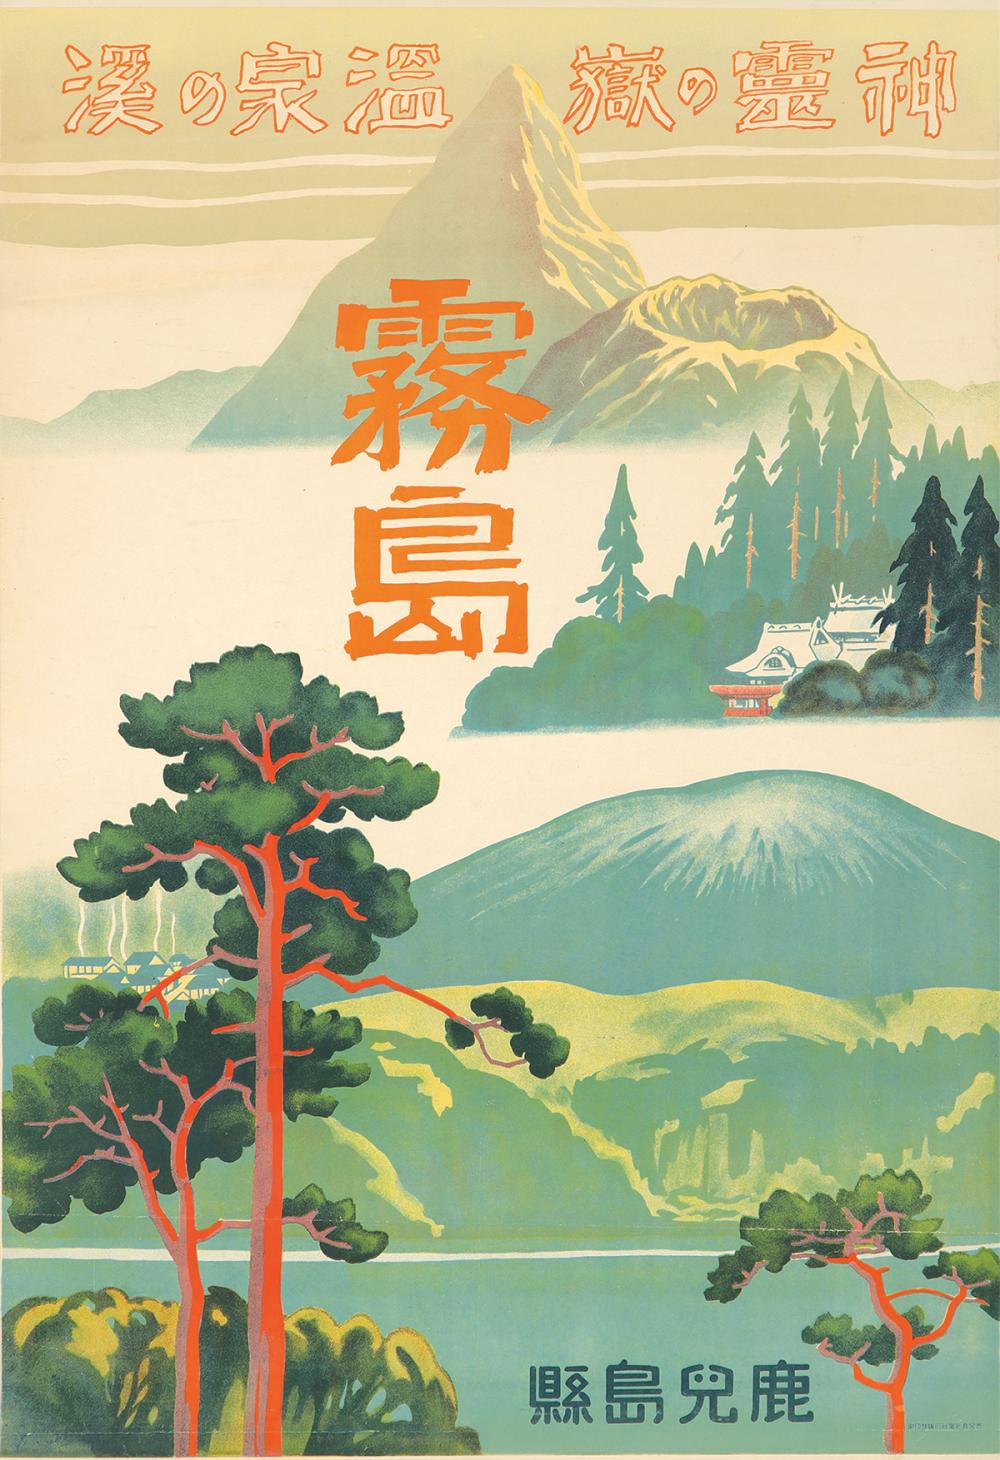 Kirishima / Retreat of Spirits. ca. 1934.